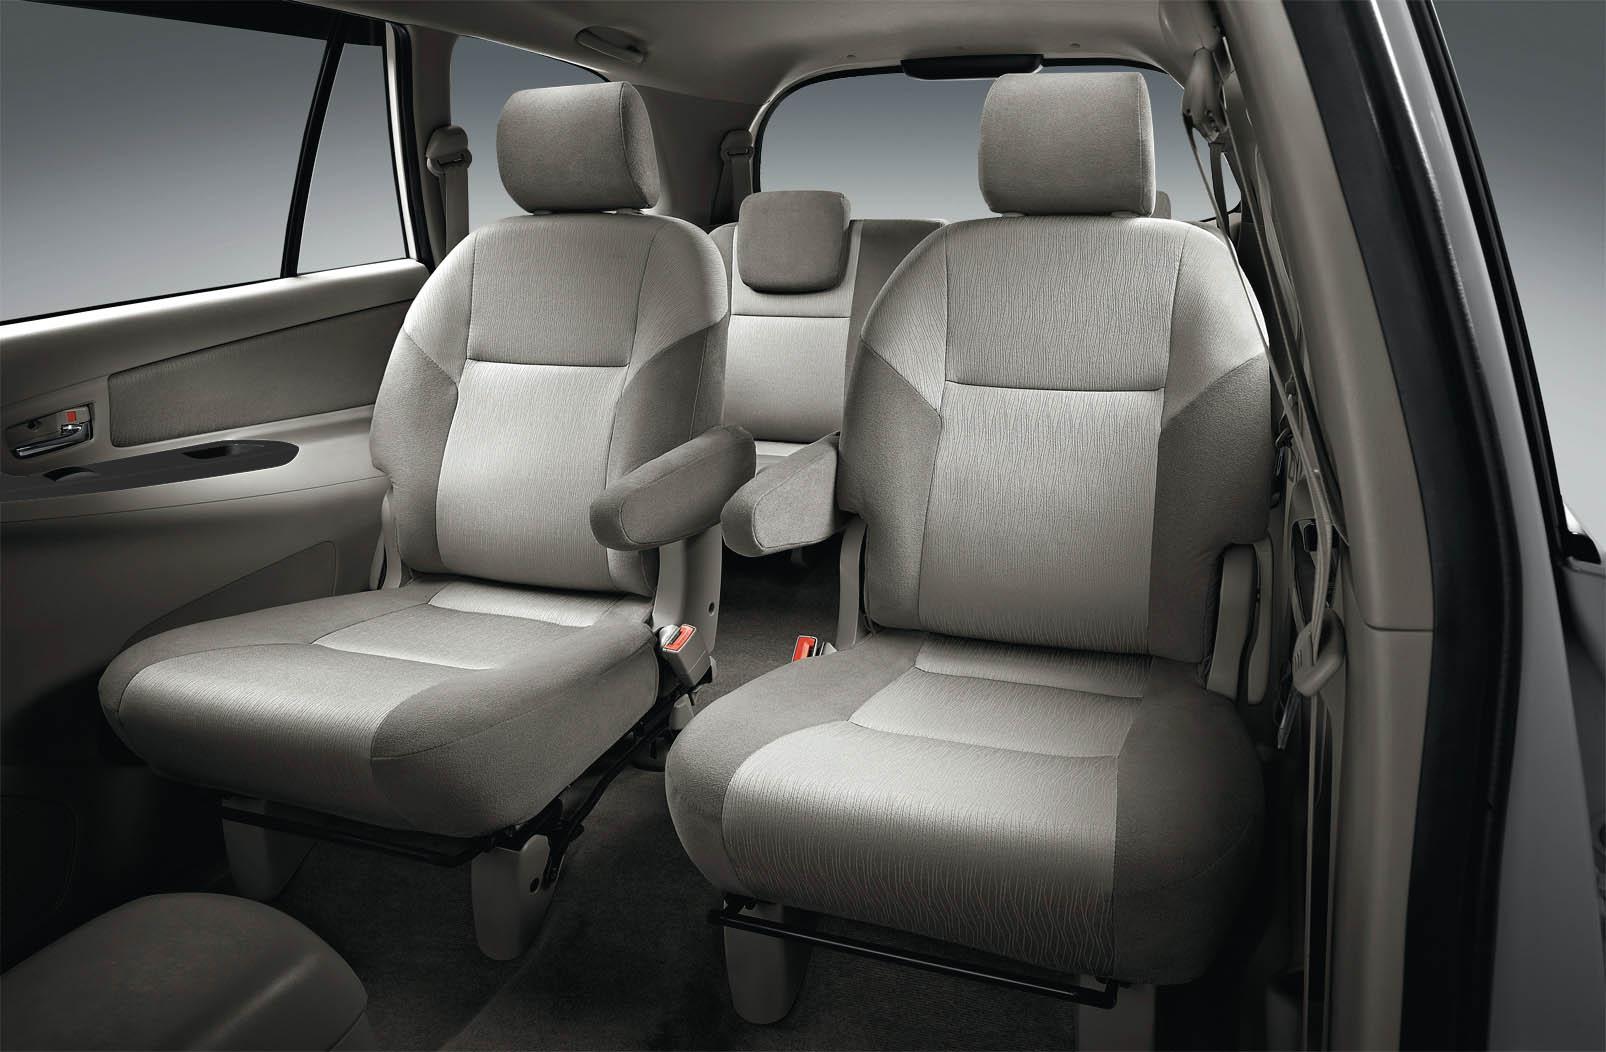 Toyota Kijang Innova 2013 Captain Seat